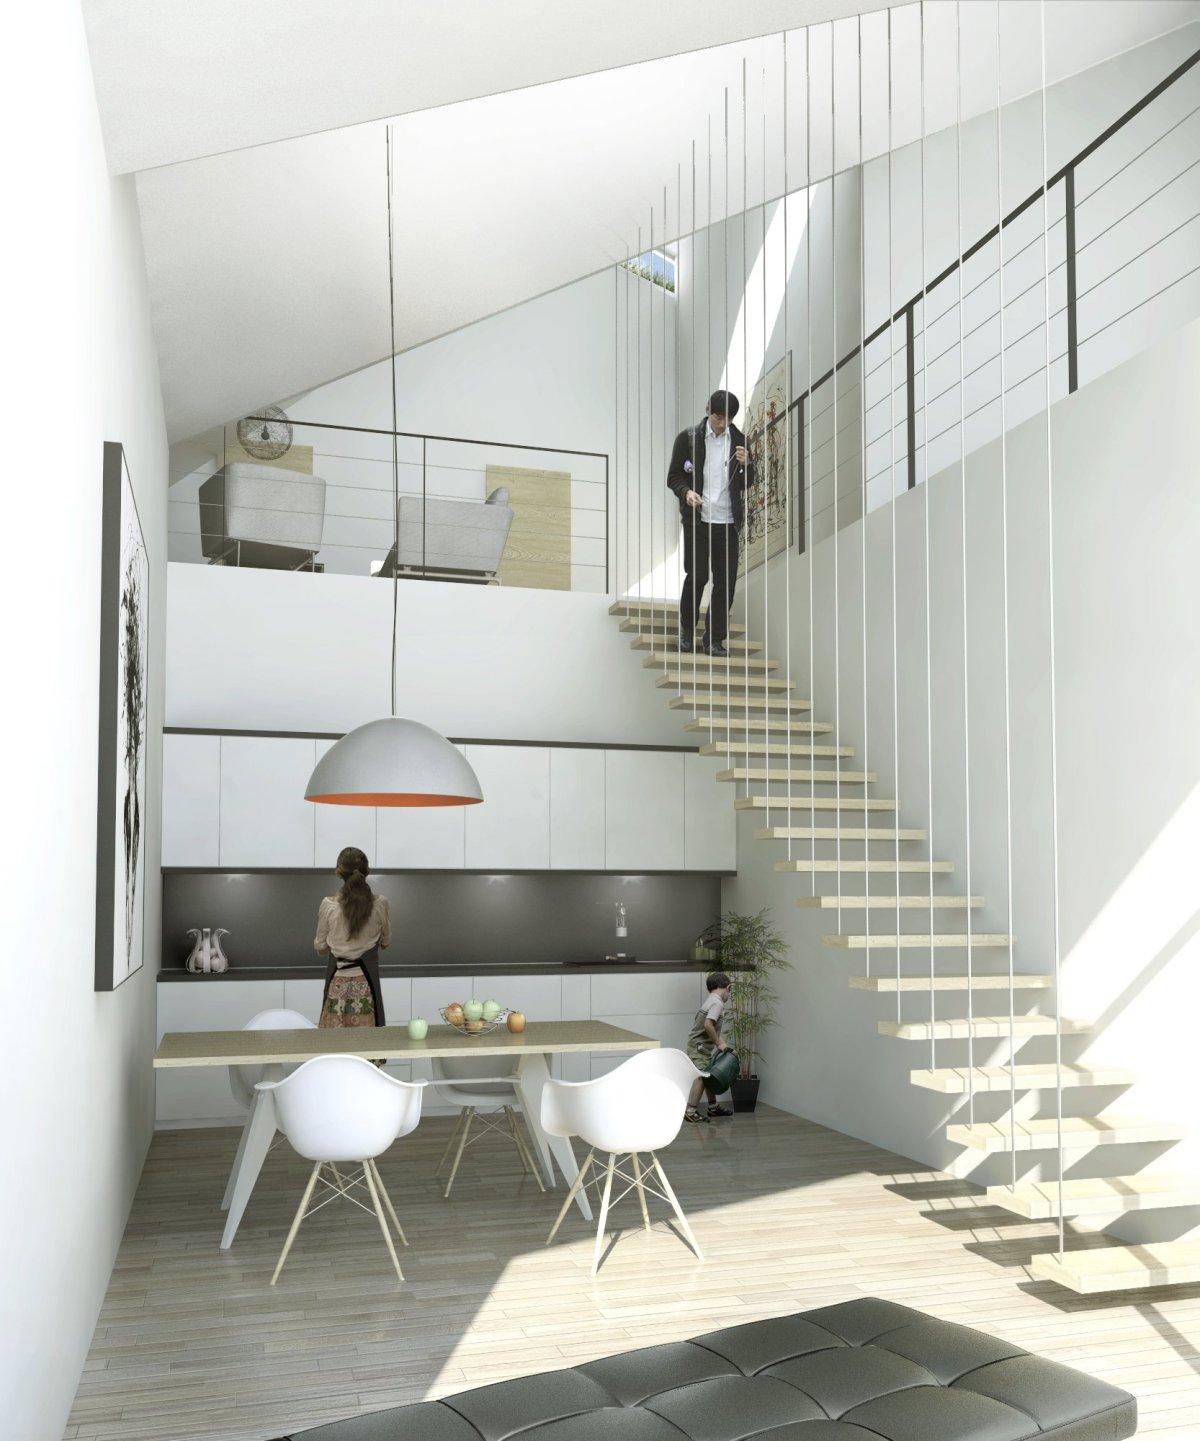 53429f99c07a80d9e300011e_hualien-residences-big-s-most-mountainous-housing-project-yet-_hua-image-by-big-38_original